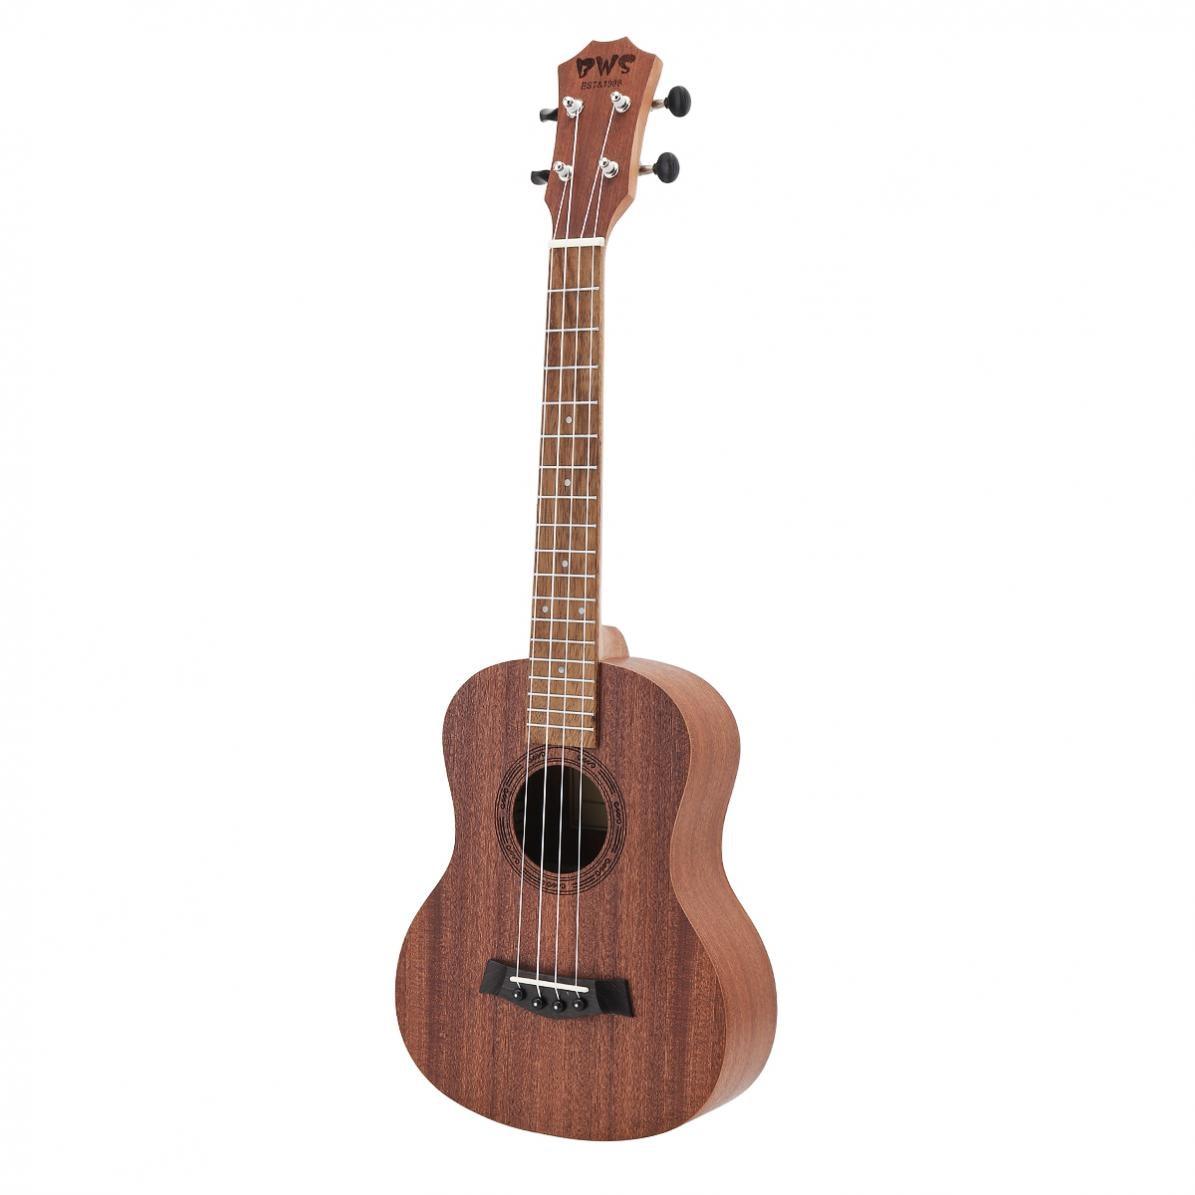 Mahogany Wood 26 Inch 18 Fret Tenor Ukulele Acoustic Cutaway Guitar Mahogany Wood Ukelele Hawaii 4 String Guitar enlarge